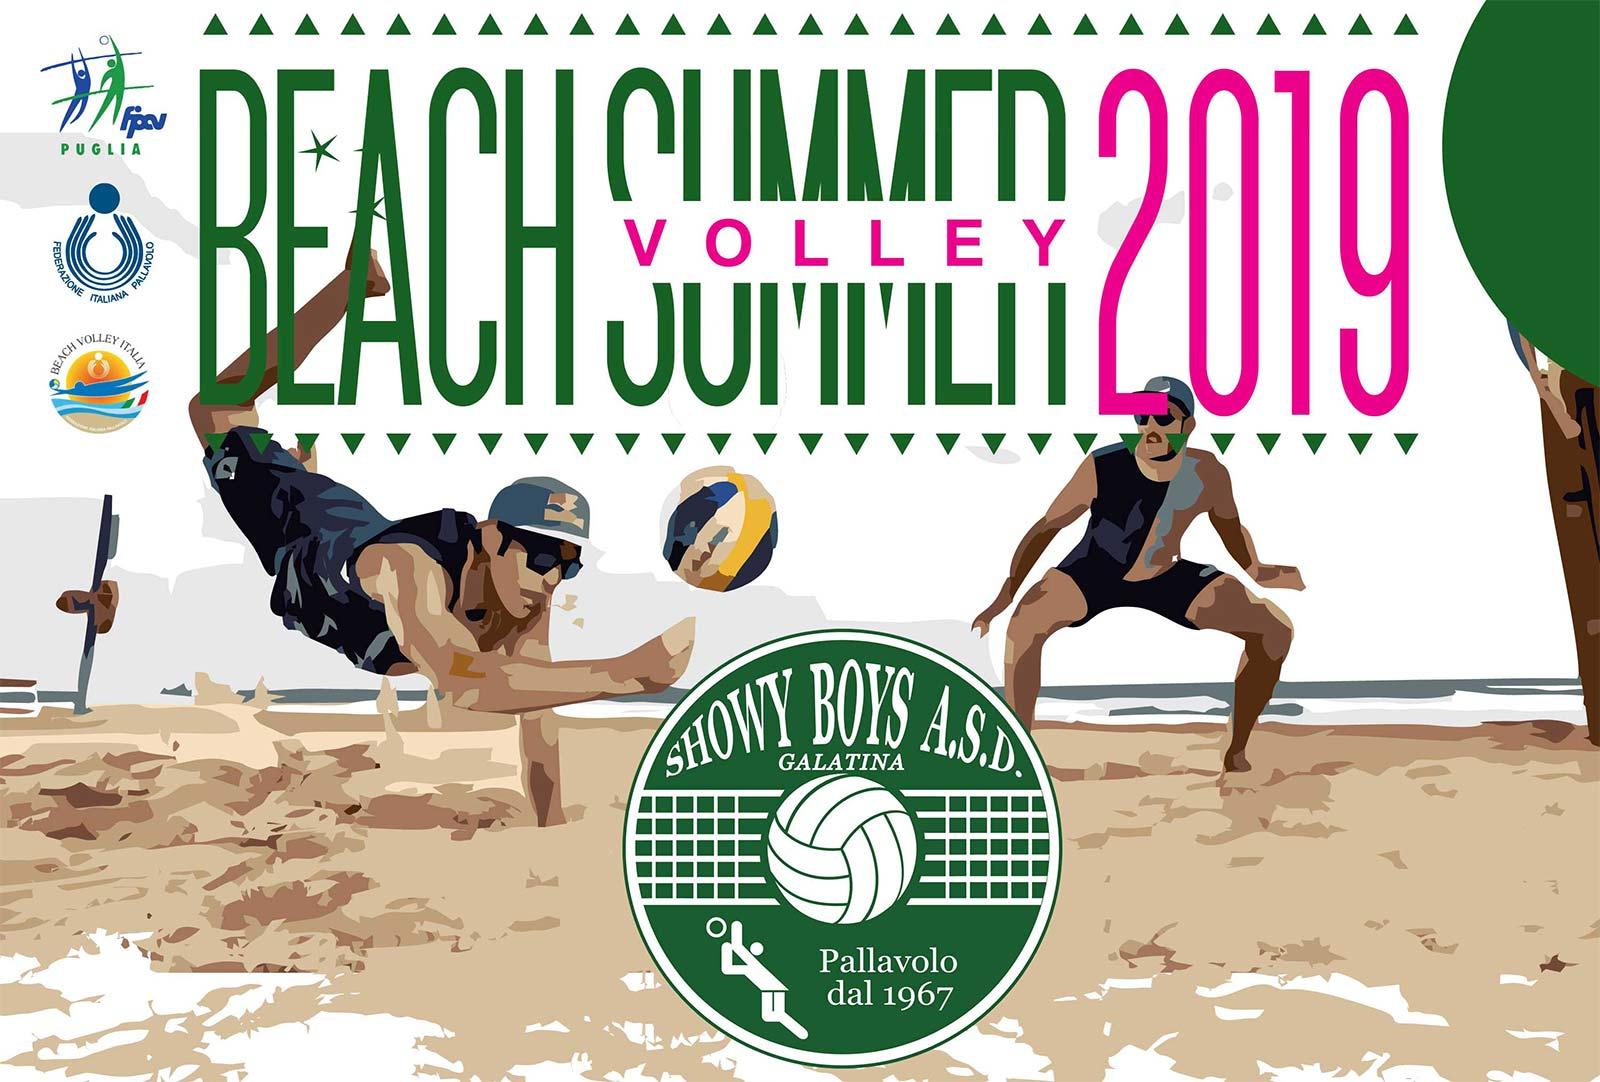 Ufficializzati tre tornei di beach volley